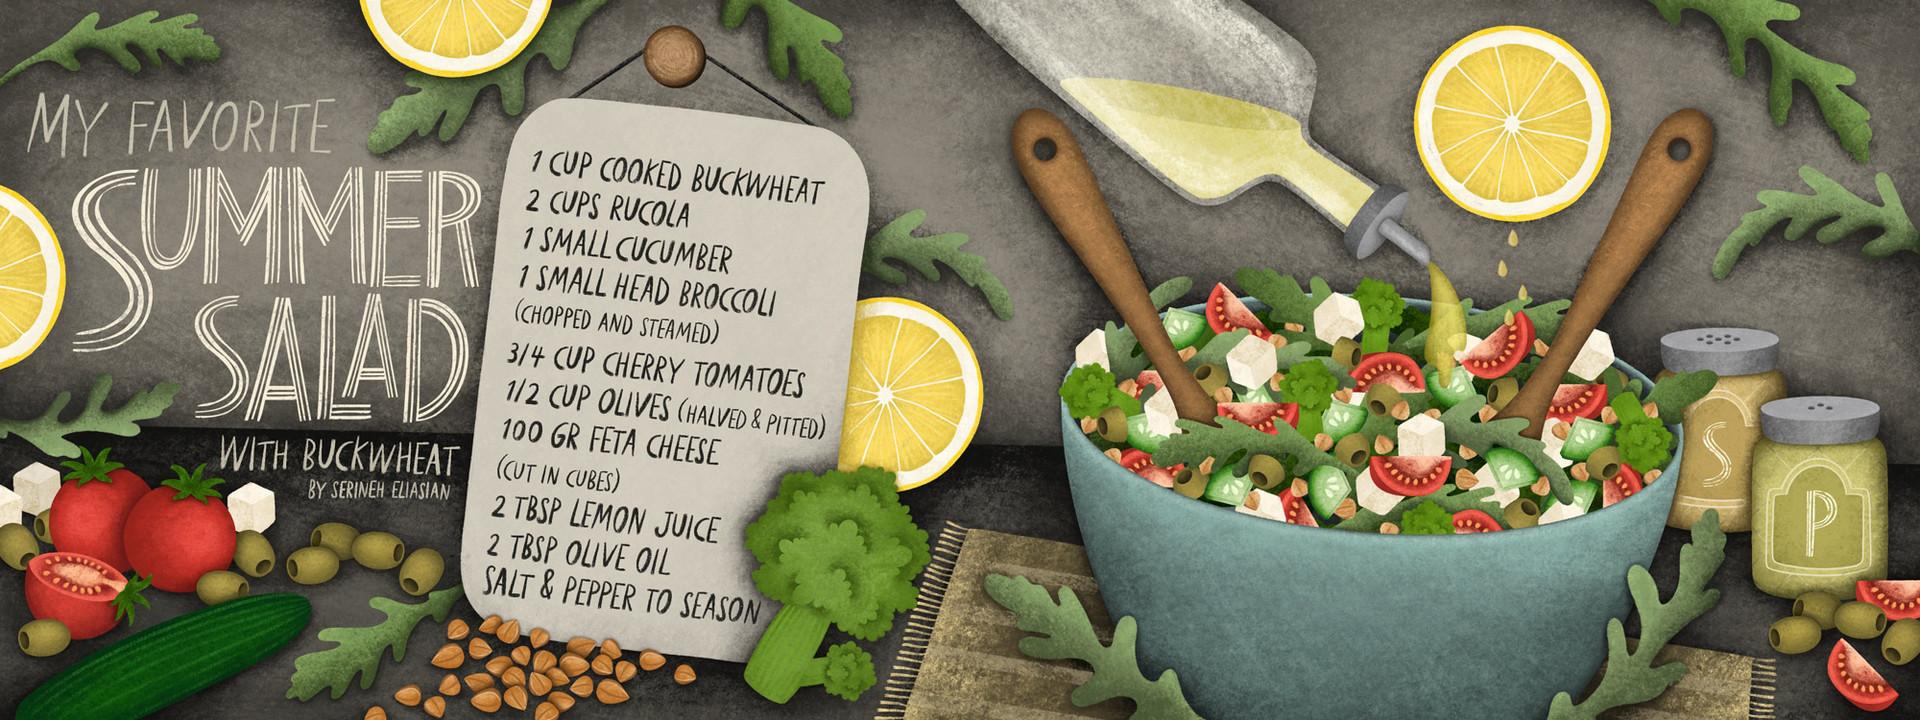 My Favorite Summer Salad